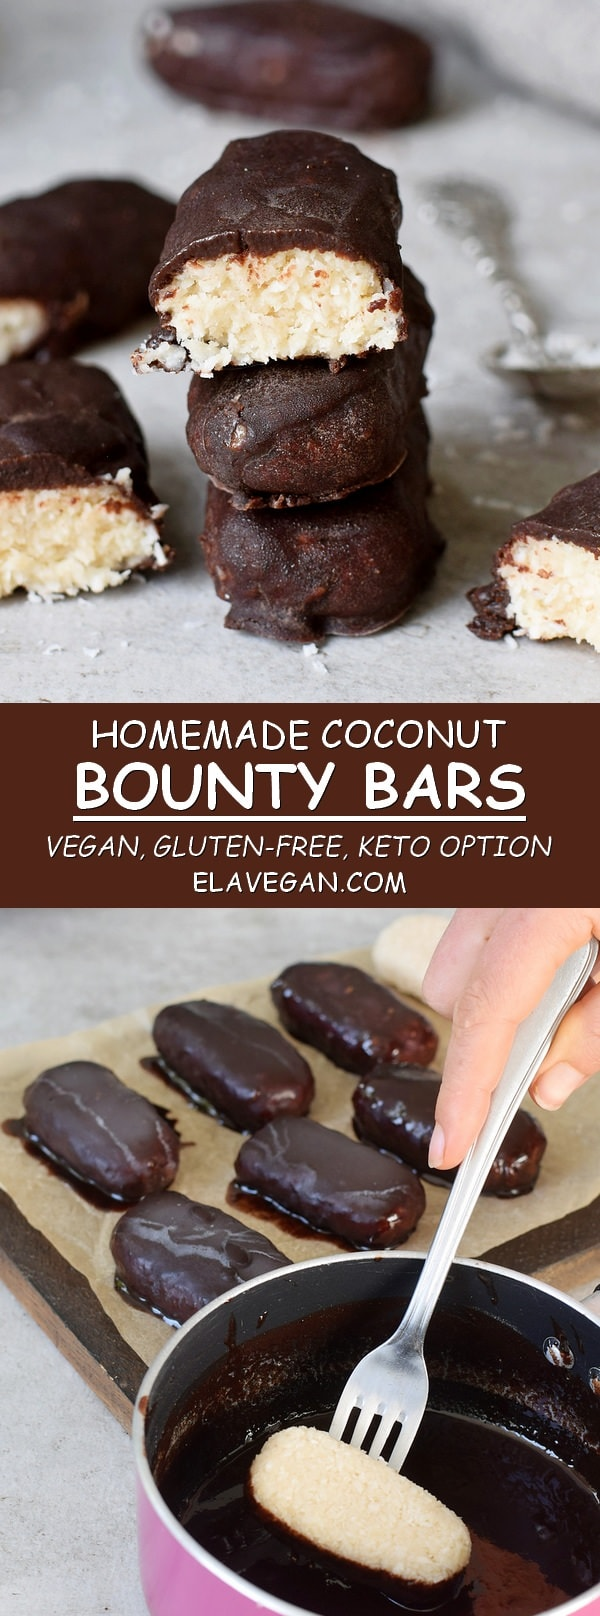 homemade coconut chocolate bounty bars vegan keto gluten-free recipe